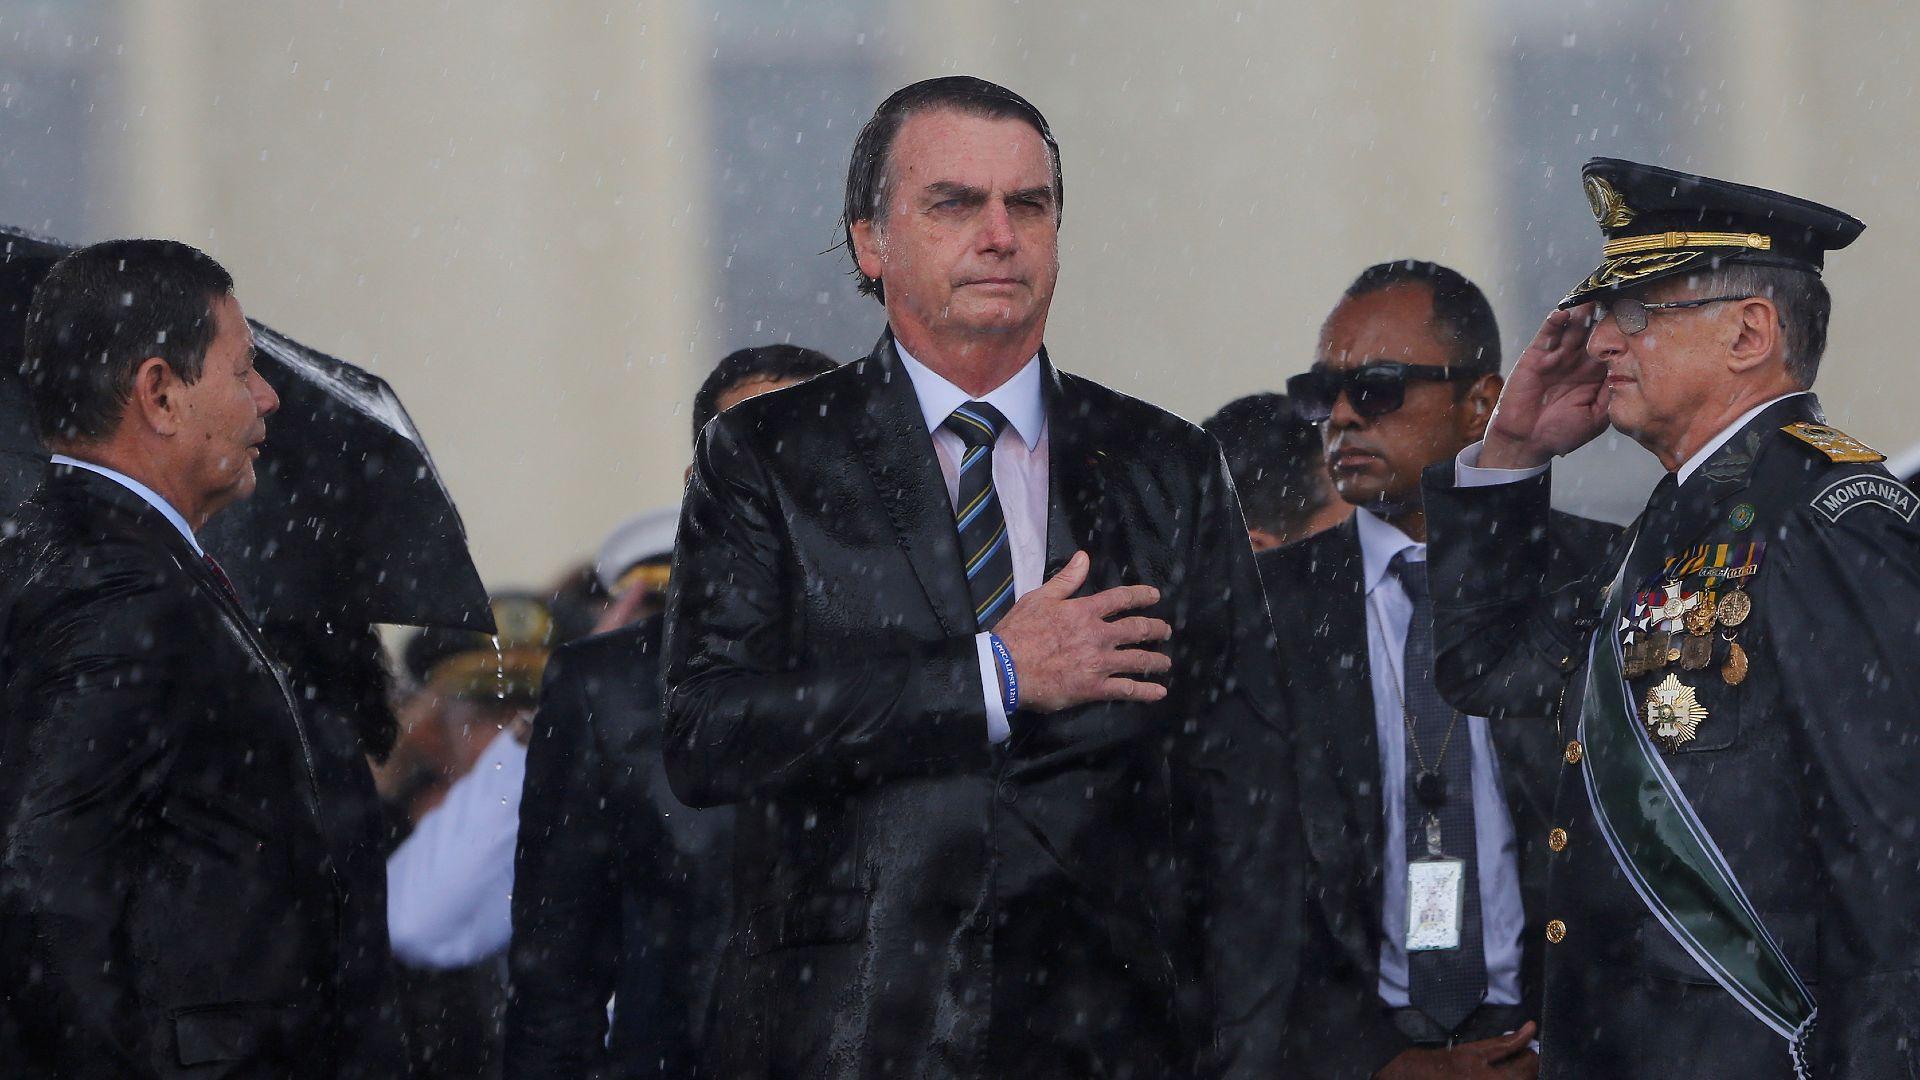 https://img2.rtve.es/imagenes/dimite-bloque-cupula-militar-brasil/1617203300092.jpg